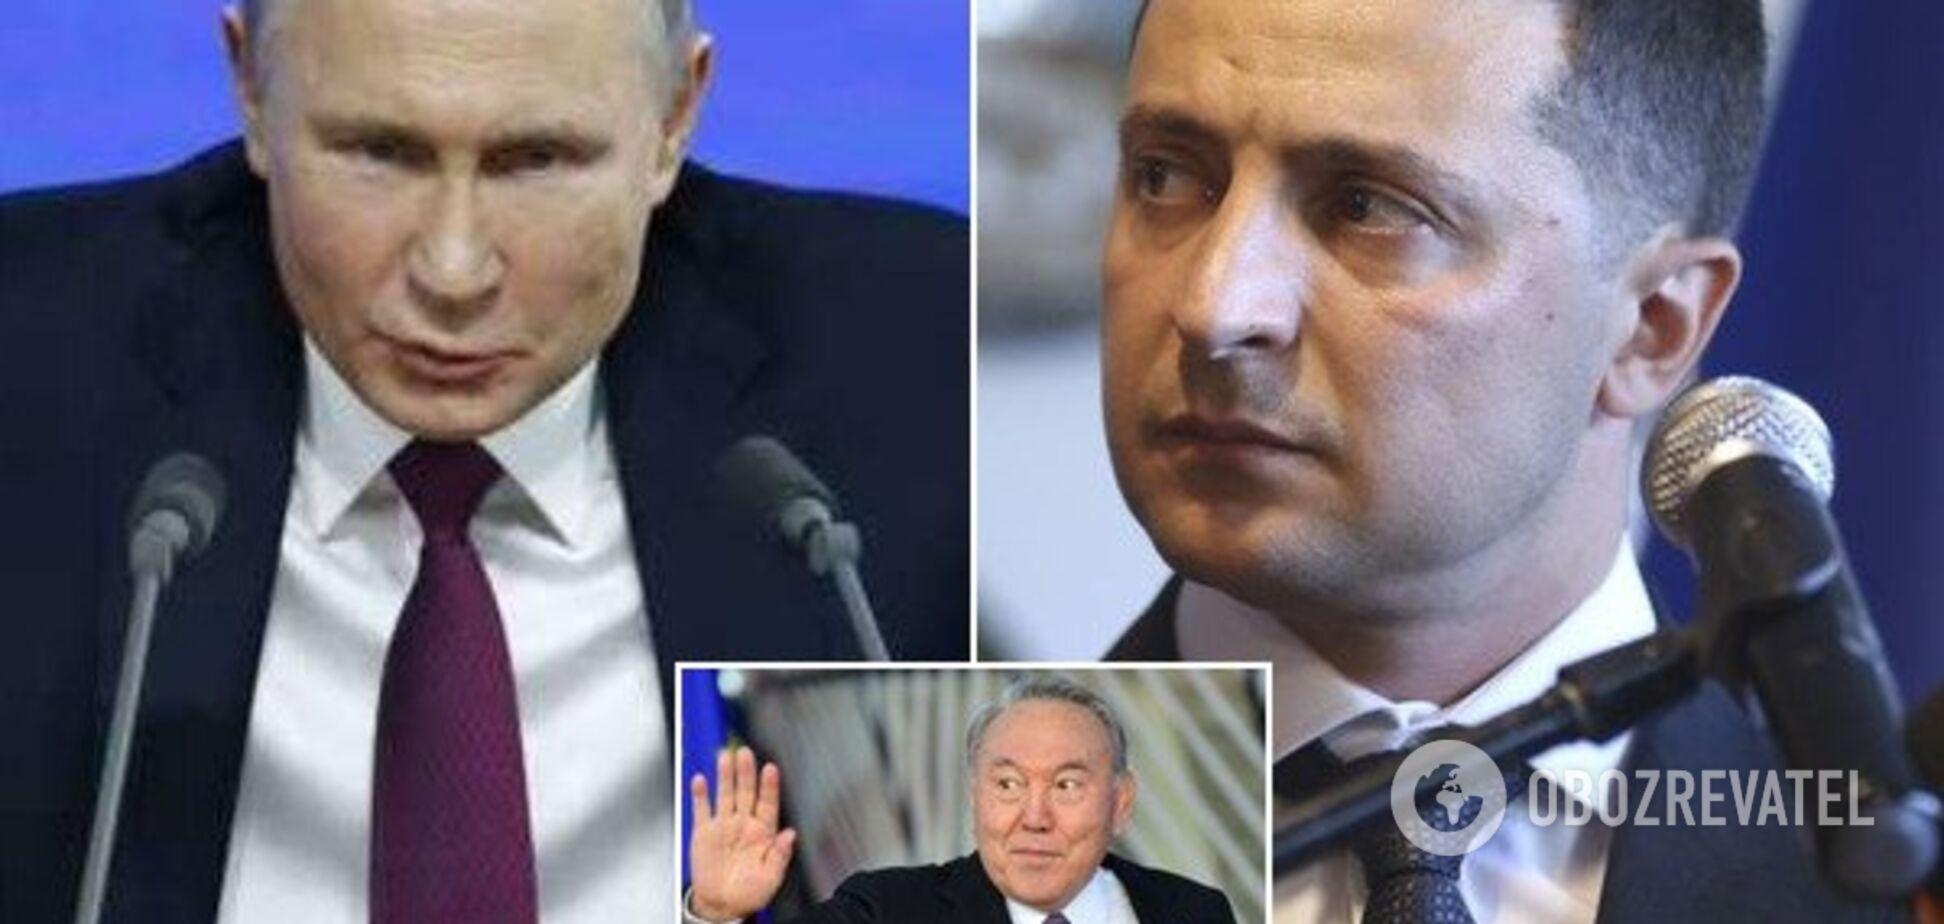 Путин, Зеленский и Назарбаев